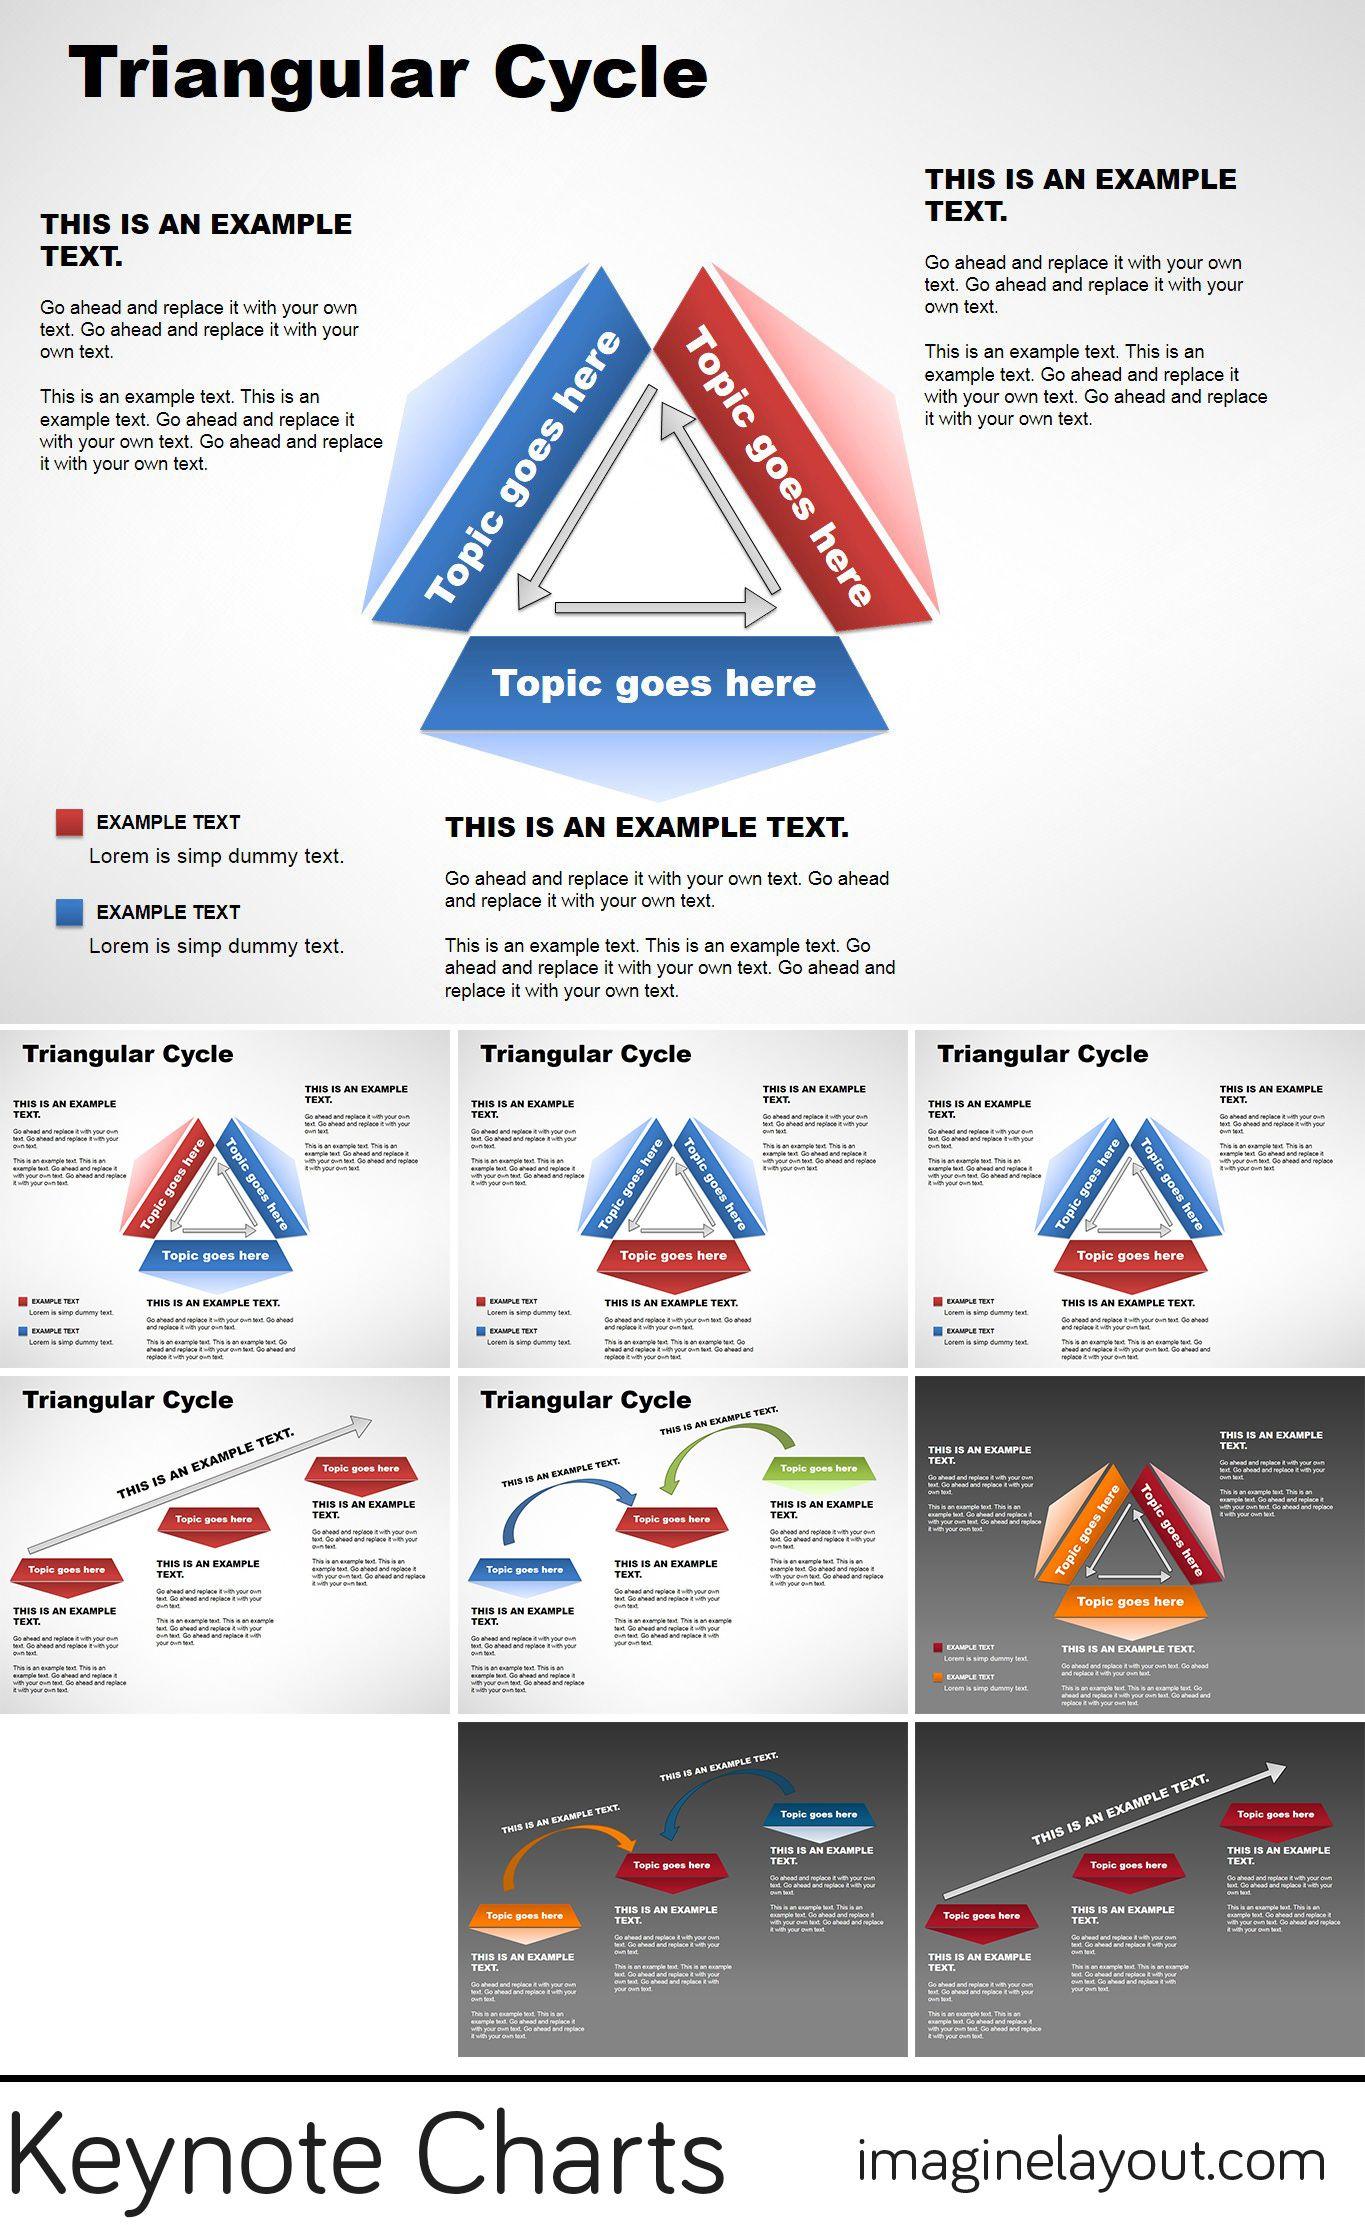 Triangular Cycle Keynote Charts Keynote Charts